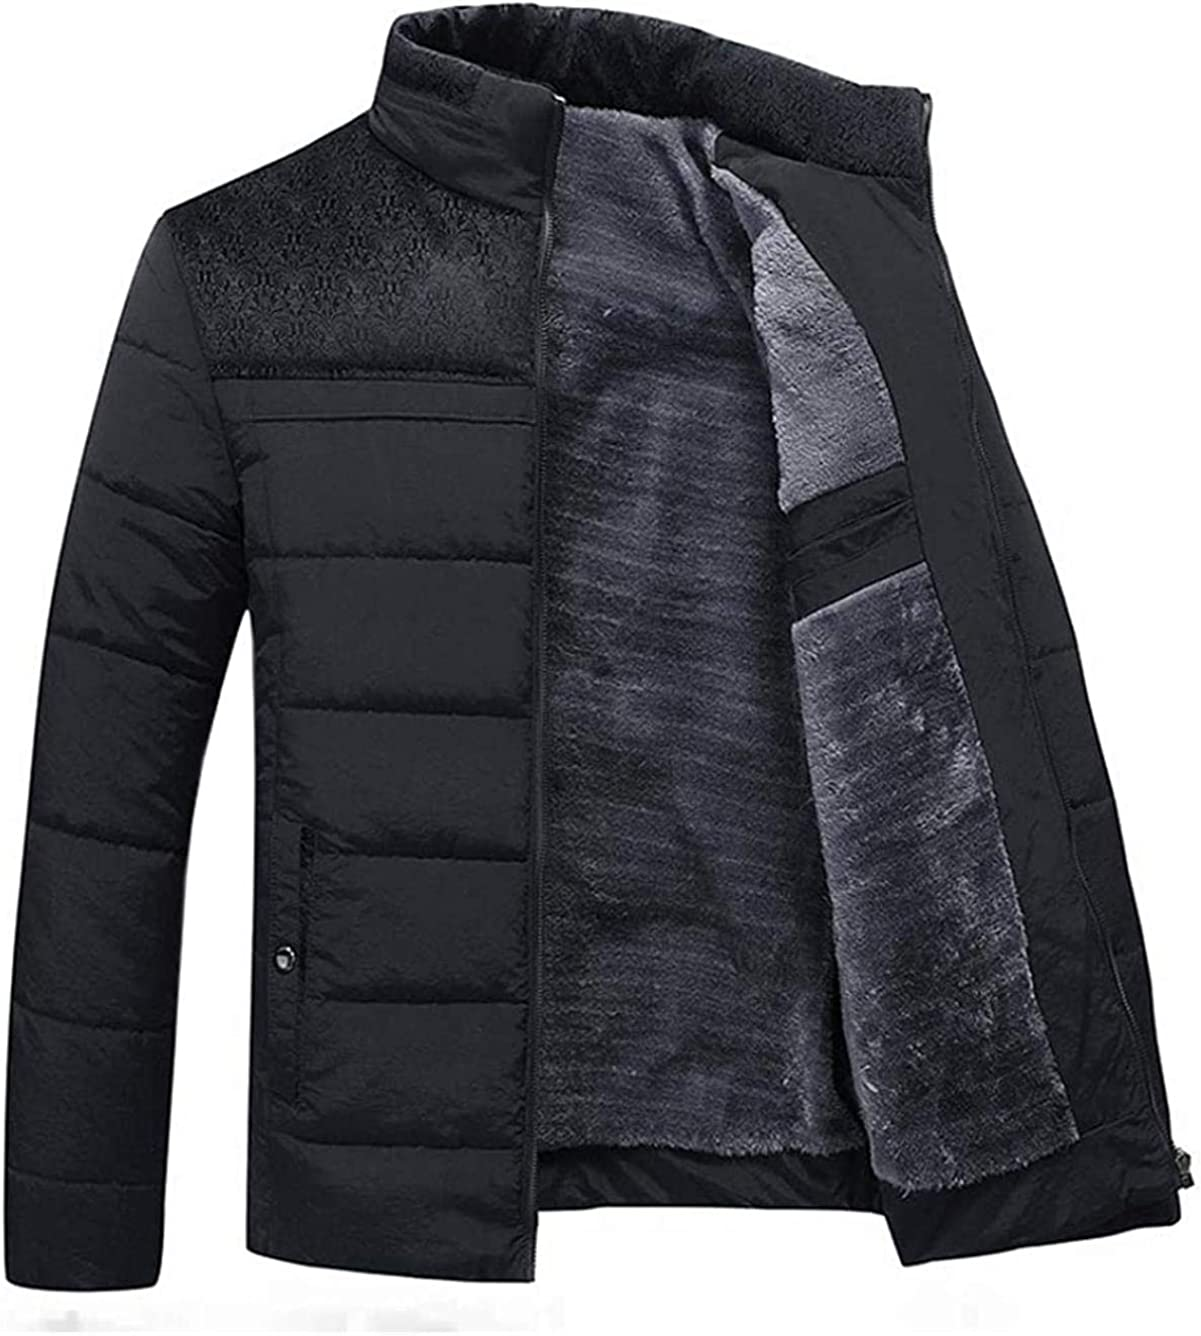 Men's Winter Stand Collar Thicken Sherpa Lined Puffer Down Alternative Jacket Coat